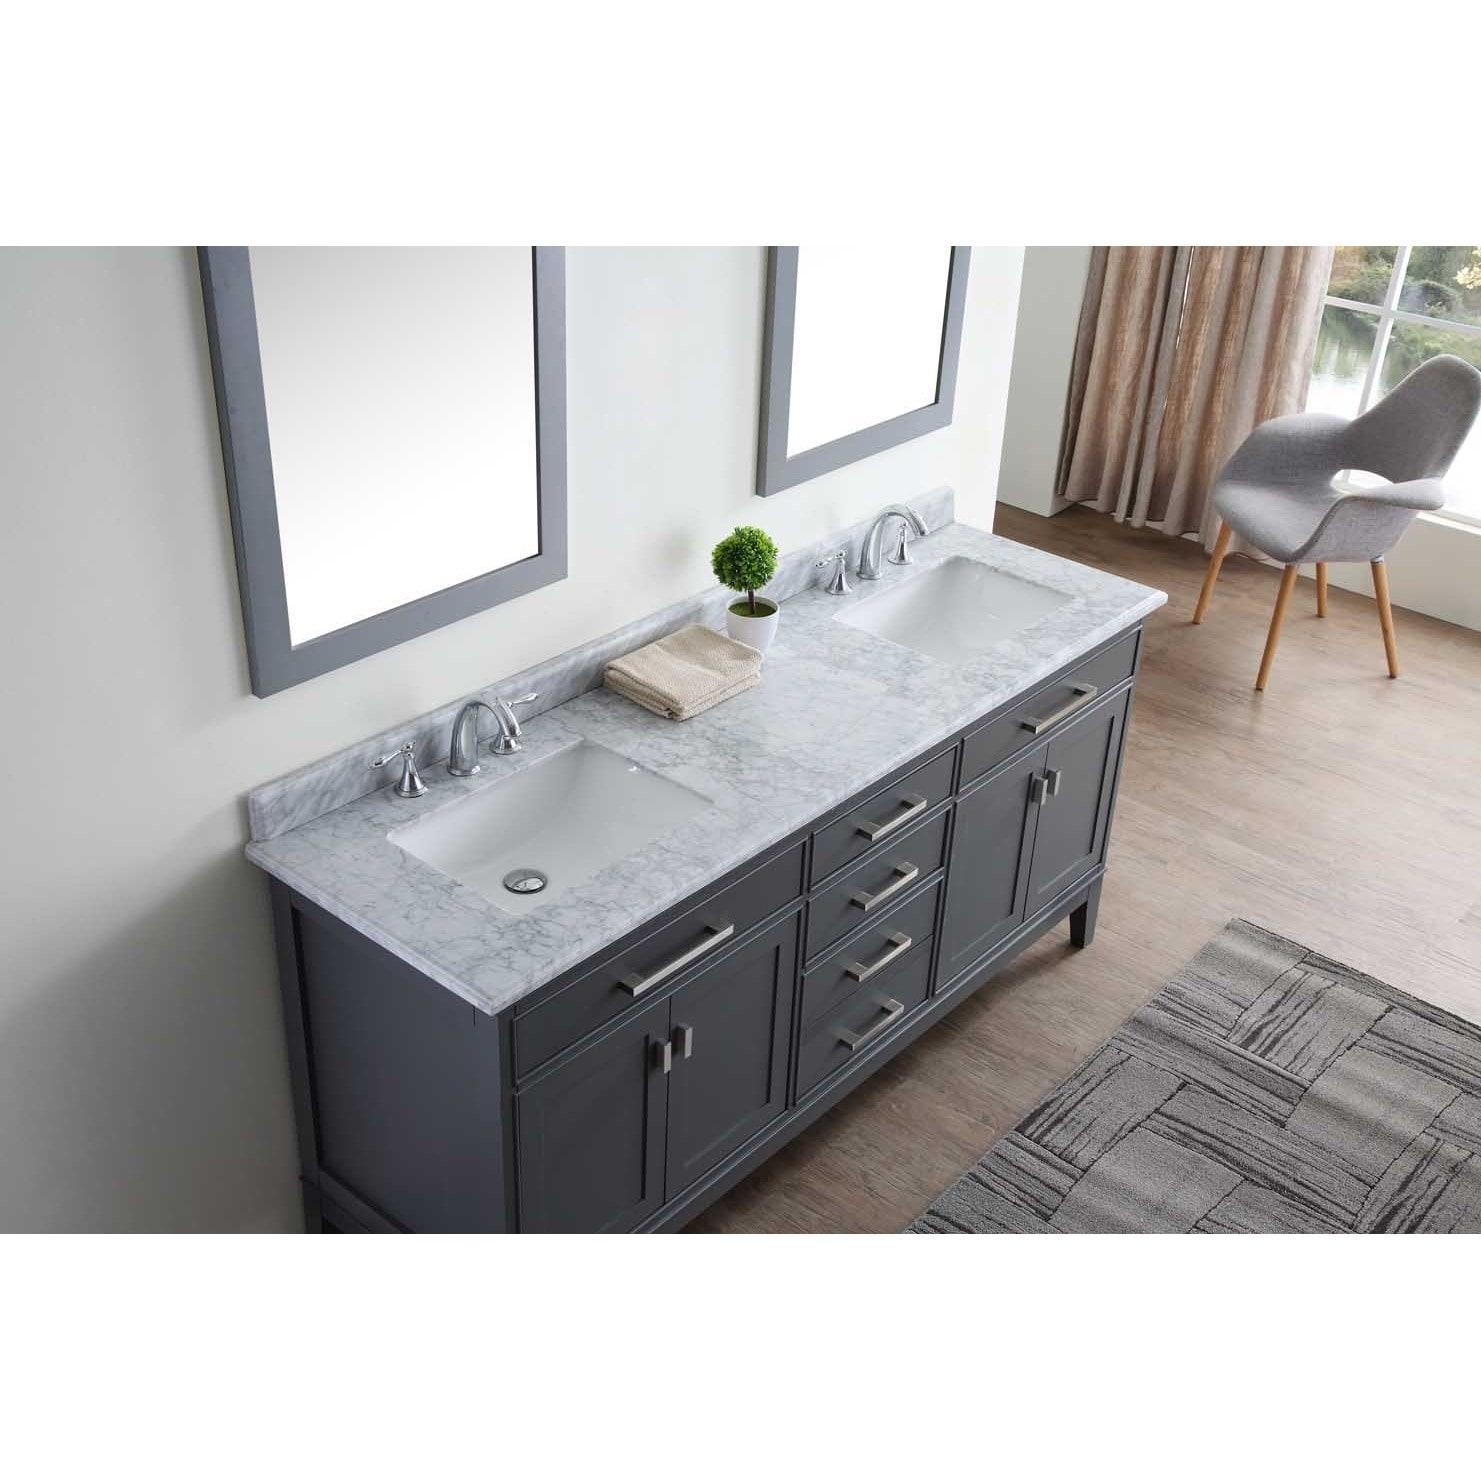 Shop Ari Kitchen and Bath Danny 72-inch Double Bathroom Vanity Set ...